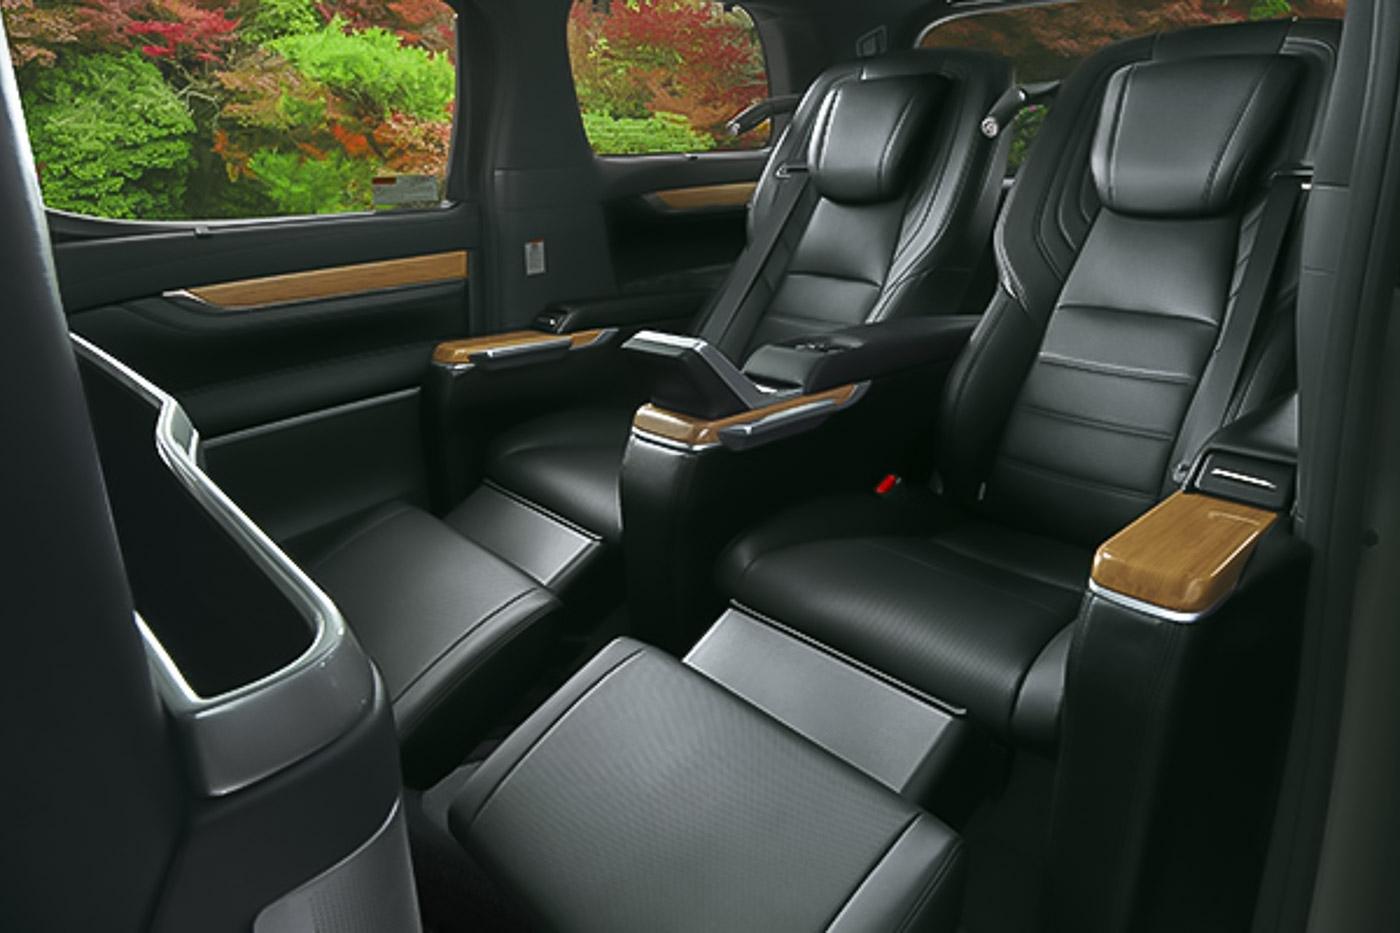 Modellista Has Made A 4 Seater Toyota Alphard Vellfire